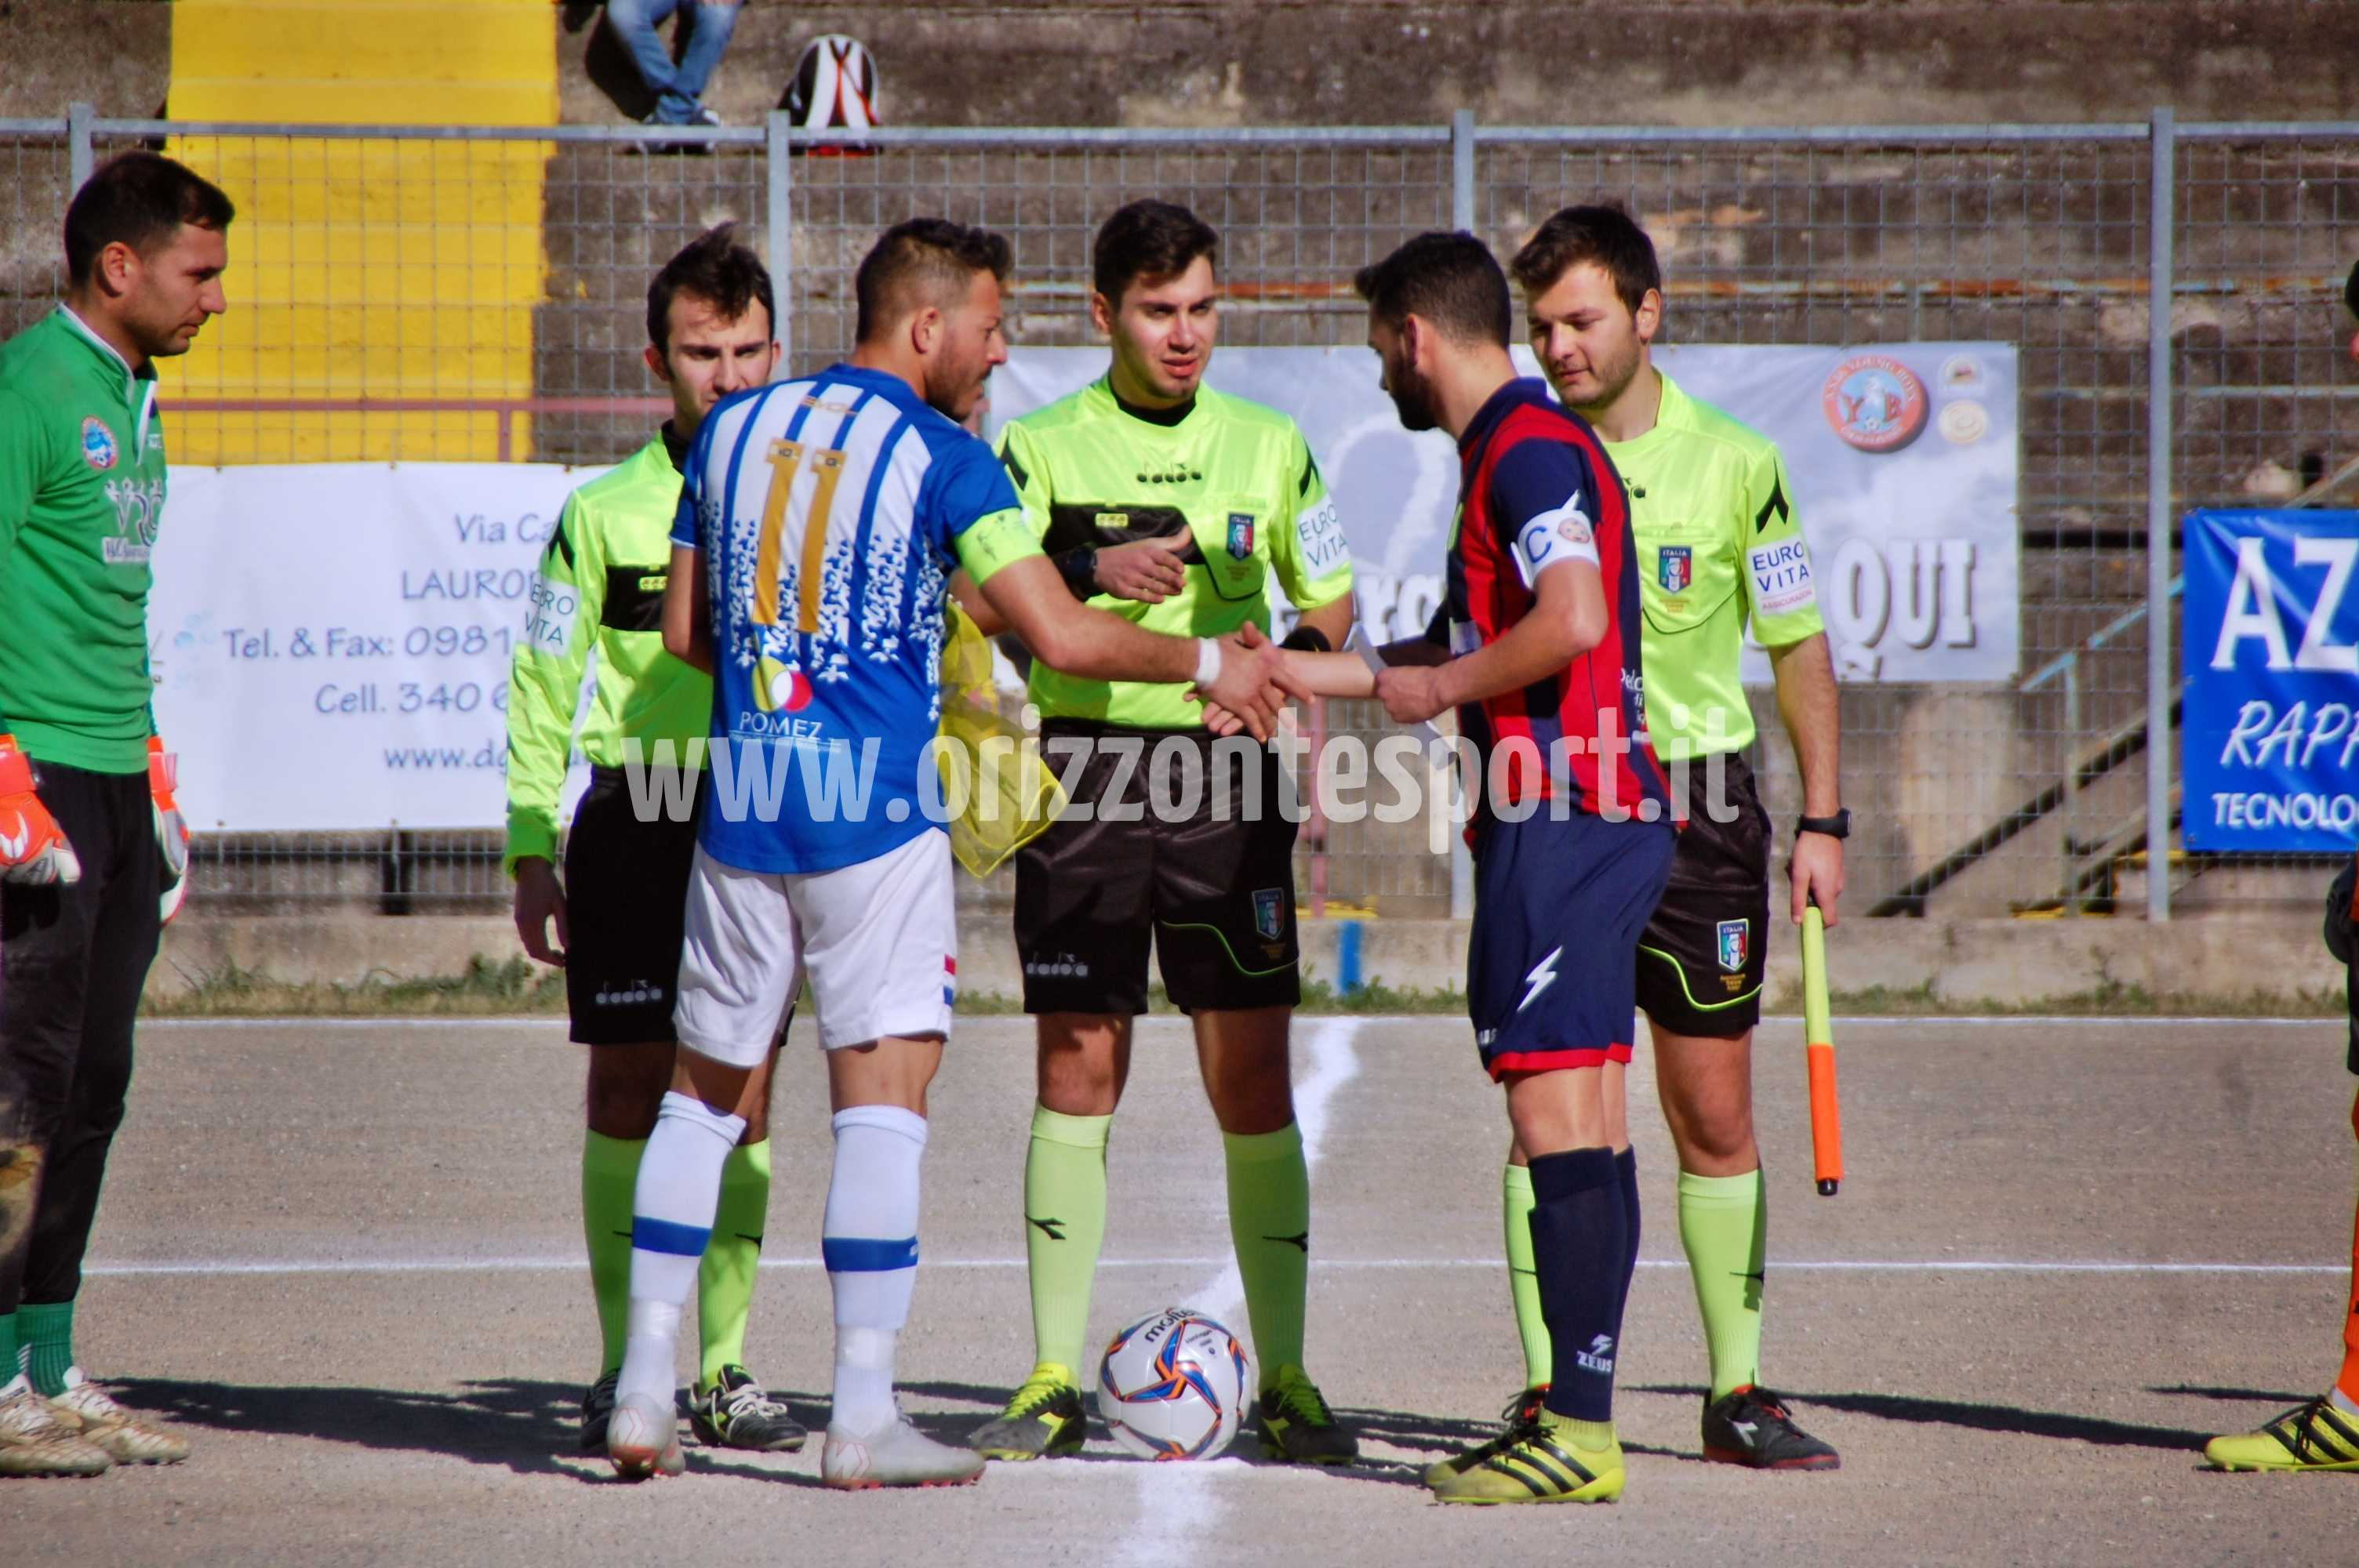 cassano_rossanese (10)